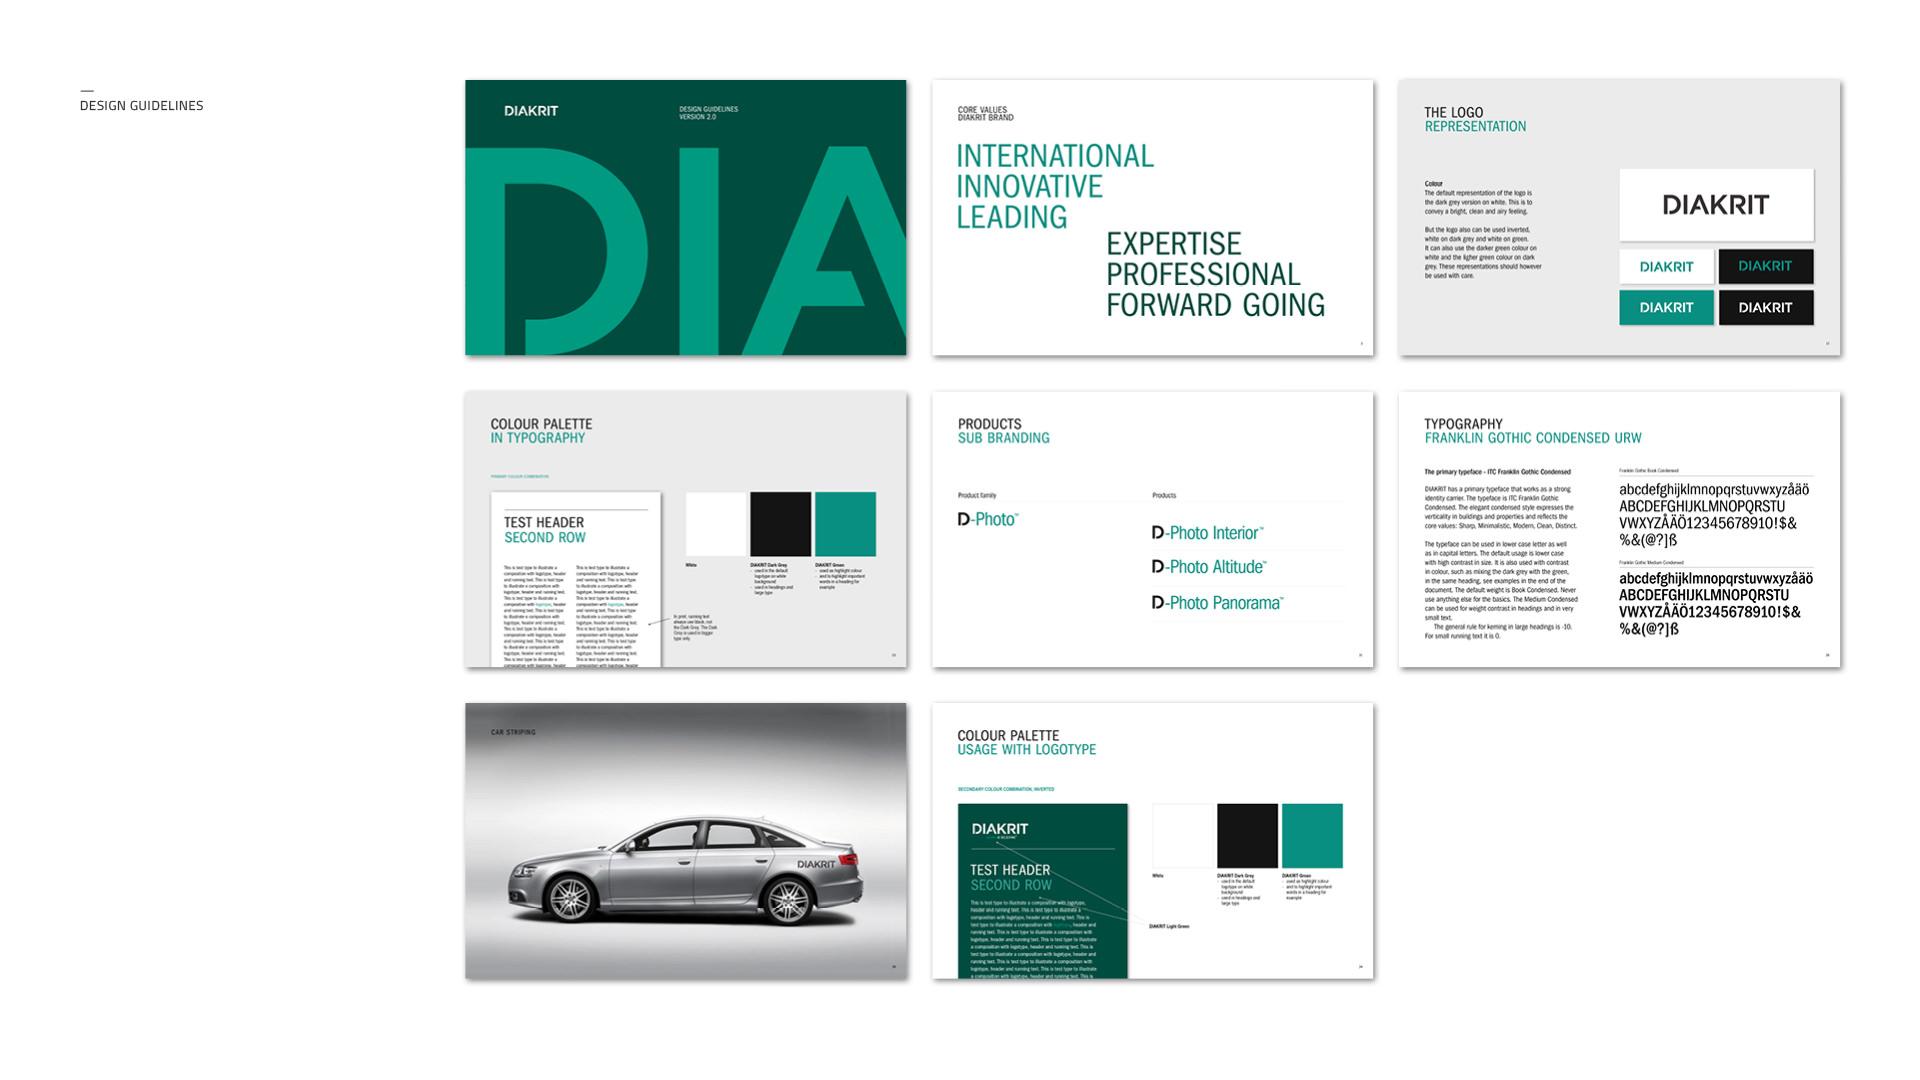 diakrit-design-guidelines-grafisk-profil